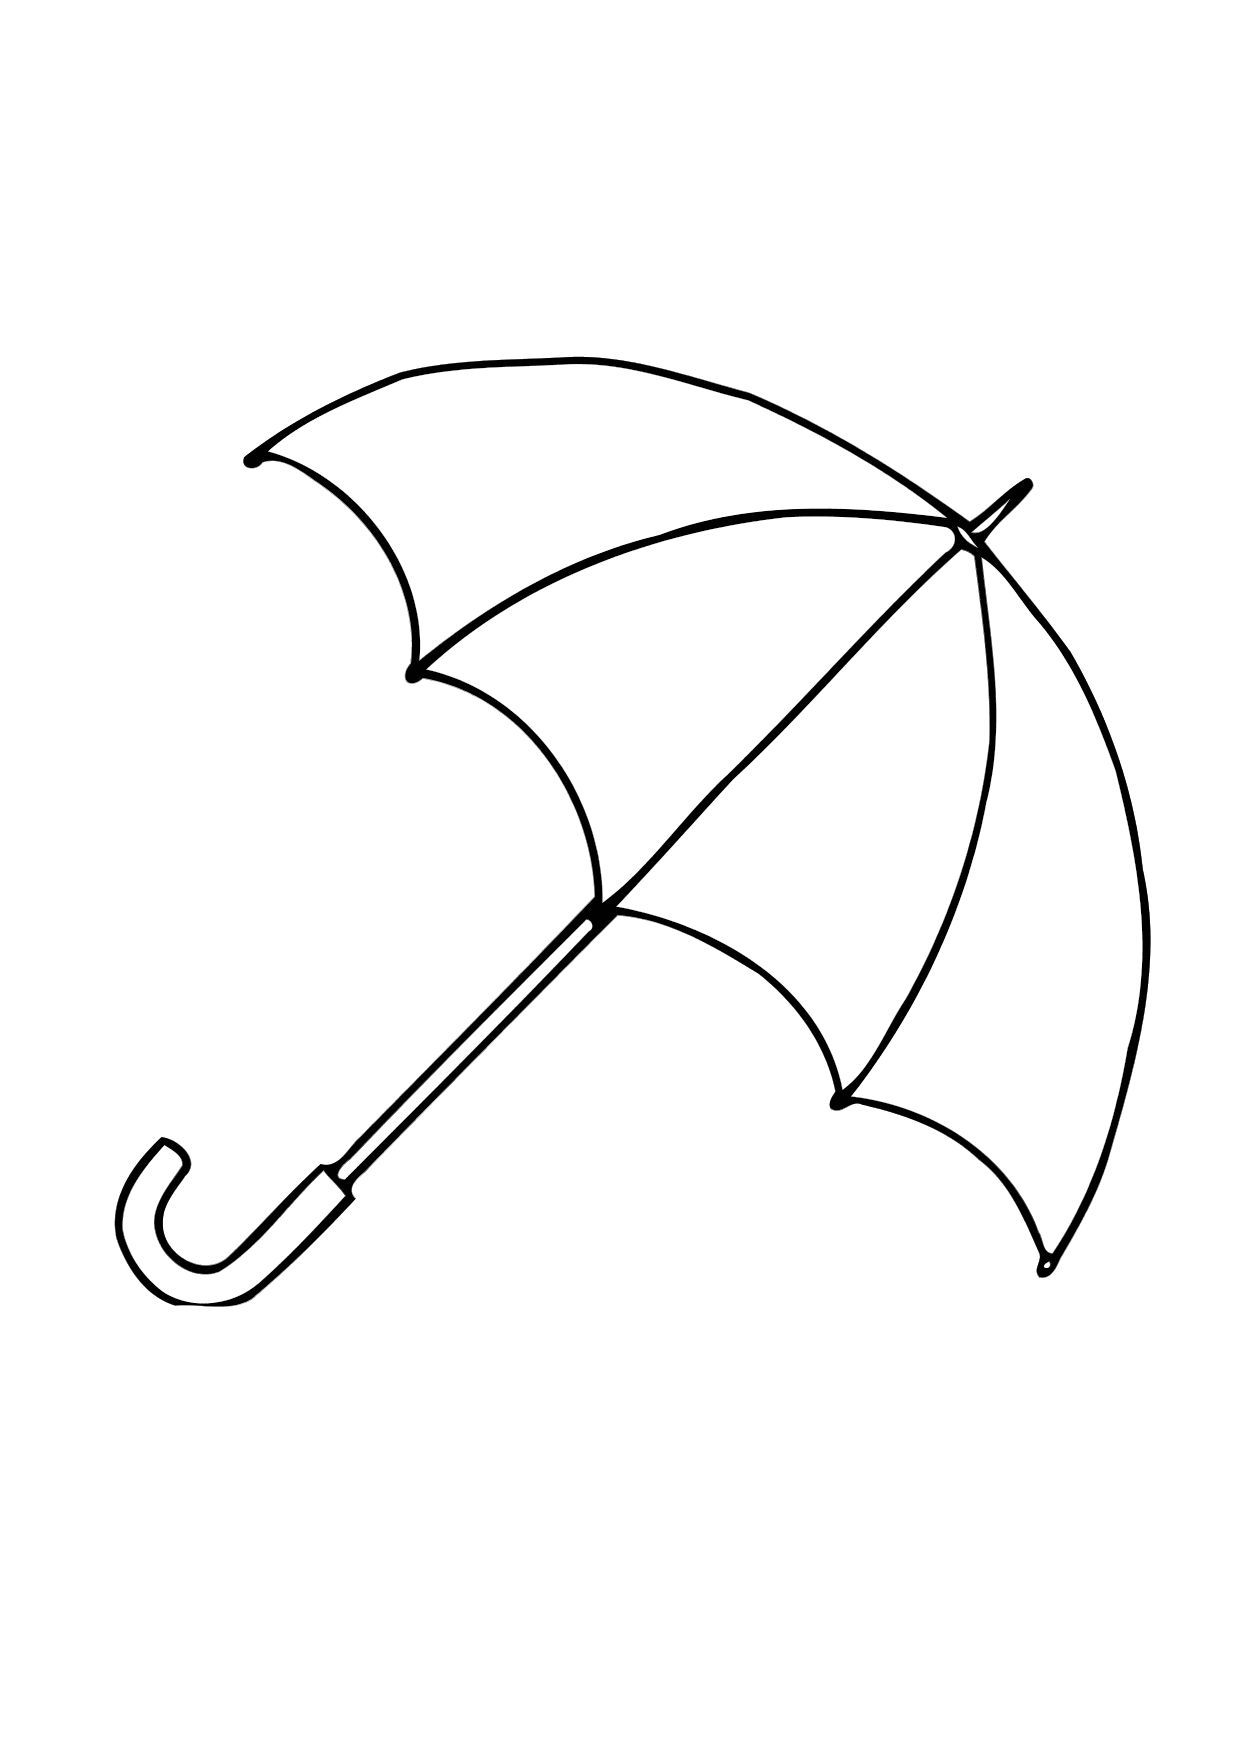 Simple Umbrella Shape Umbrella coloring page